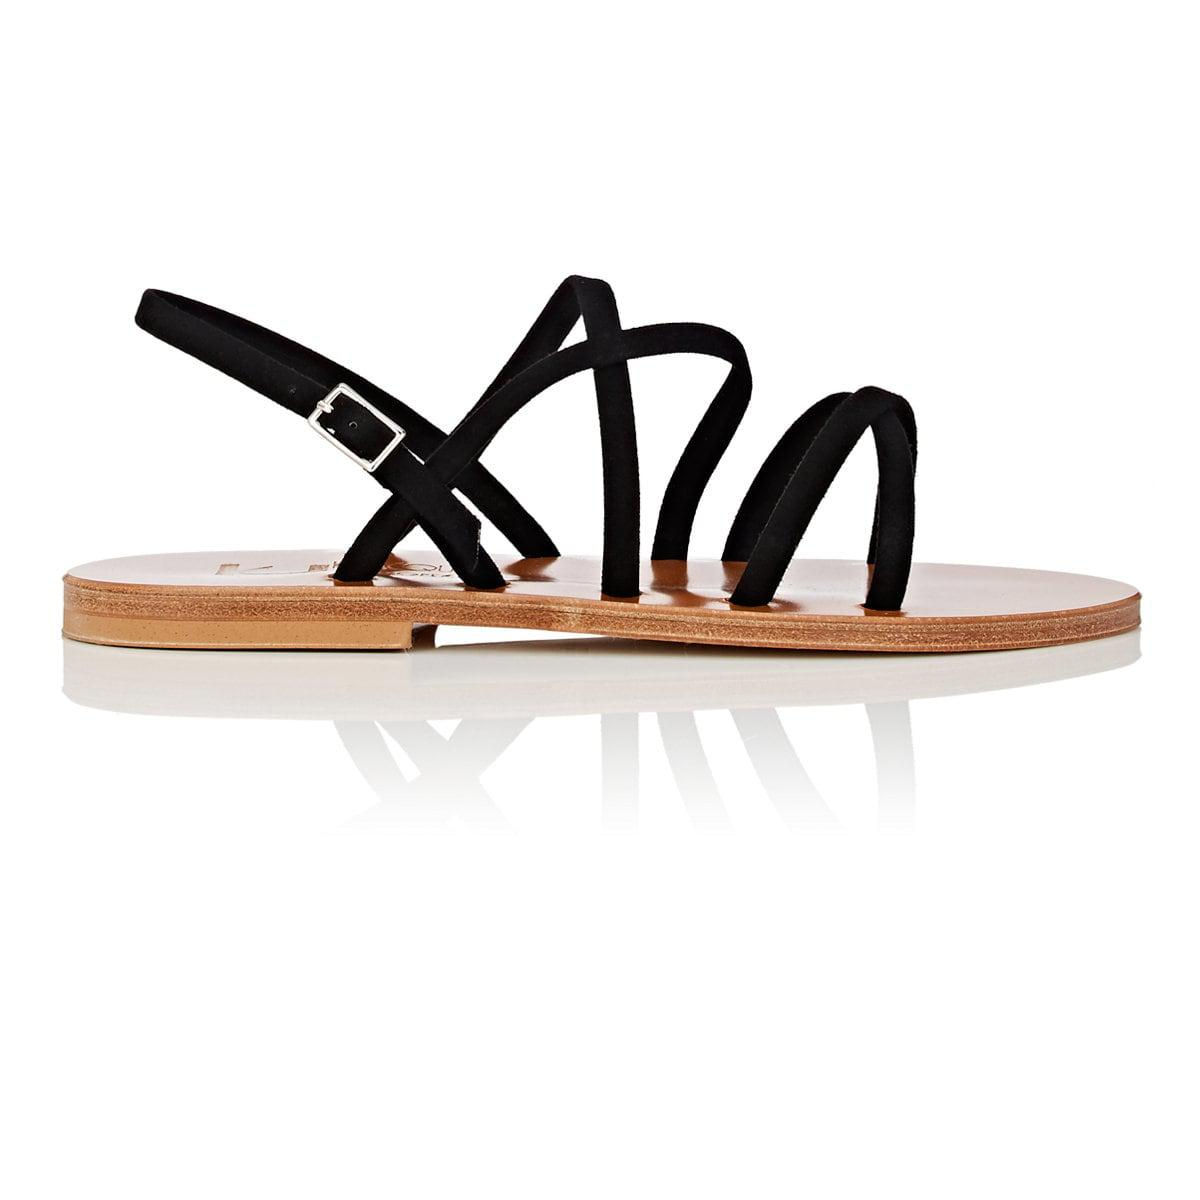 Womens Datura Metallic Suede Sandals K.Jacques kSTMXboZcM